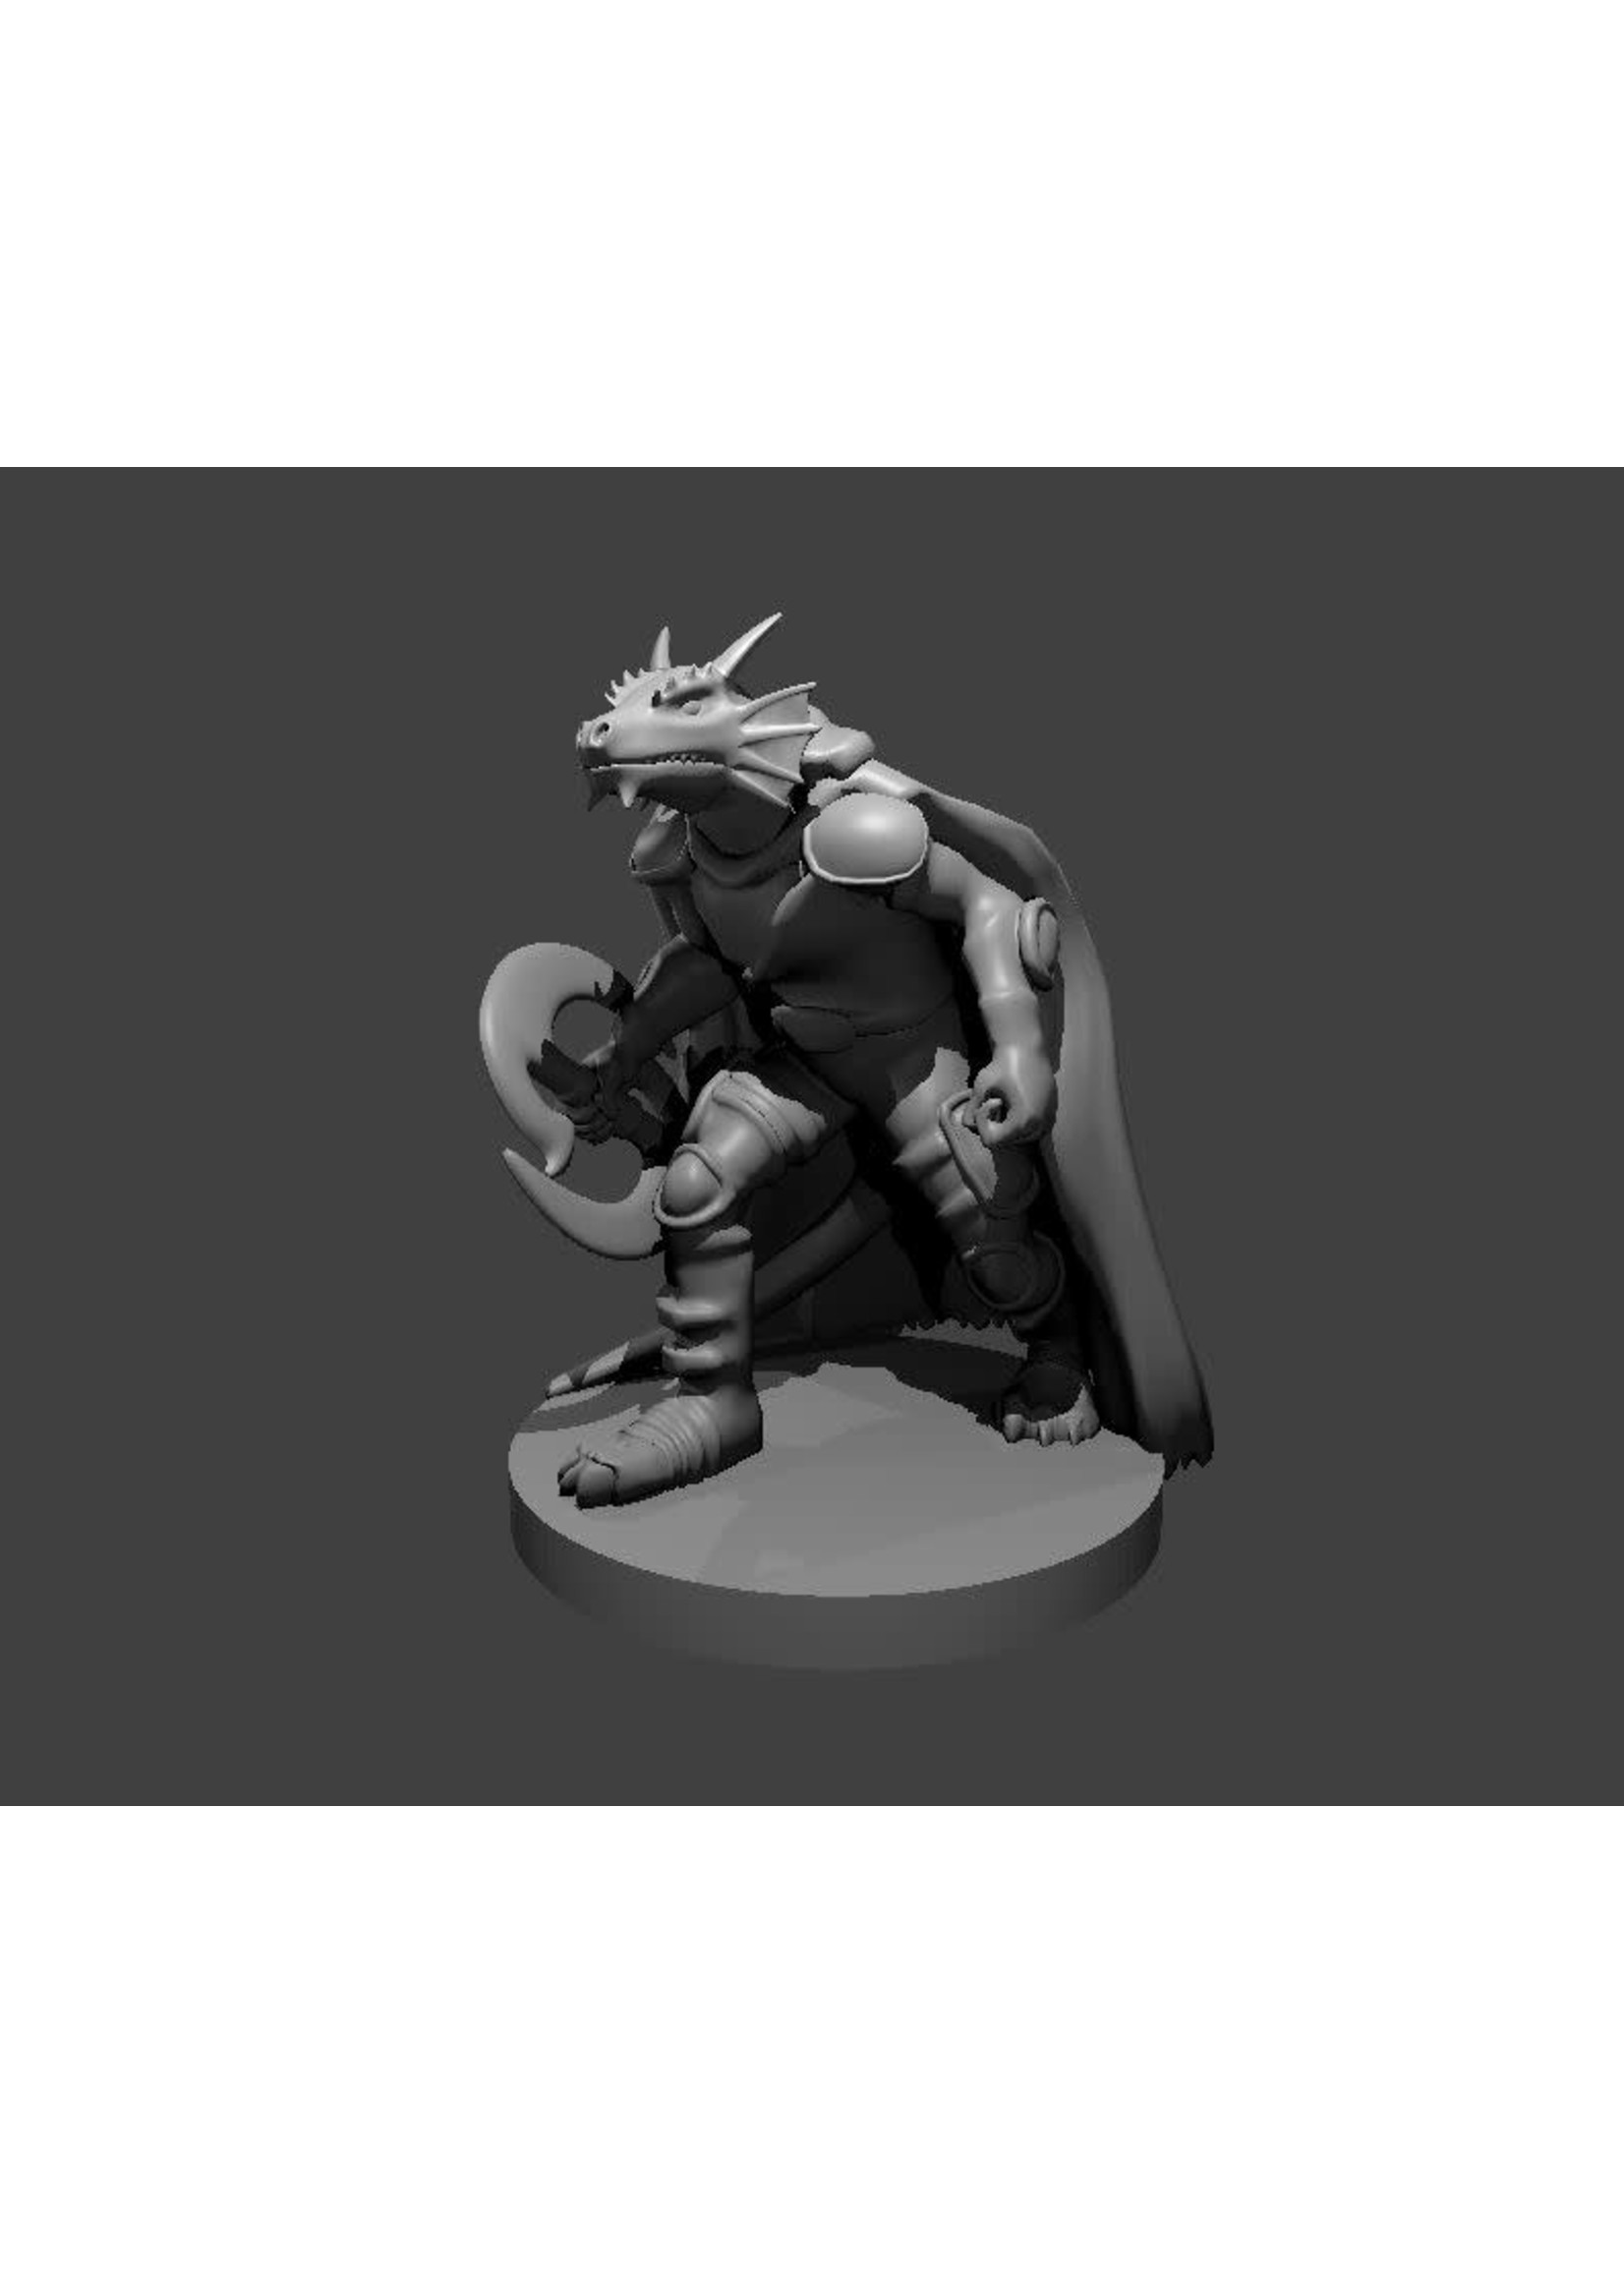 Dragonborn Chakram Fighter (Patreon Mz4250)